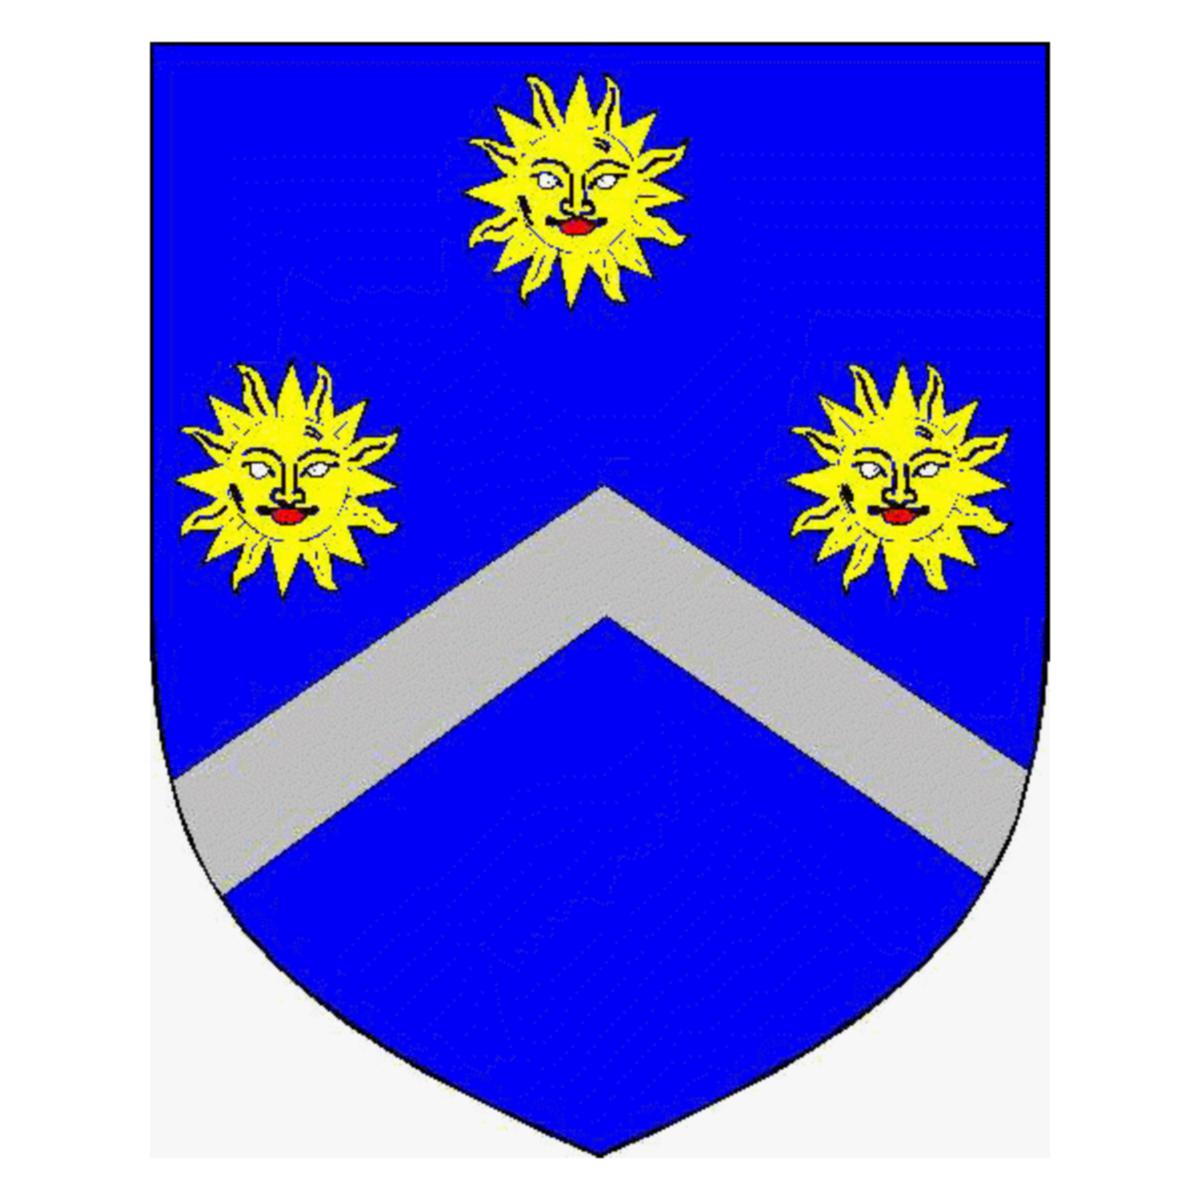 Terrasson De Senevas Family Heraldry Genealogy Coat Of Arms